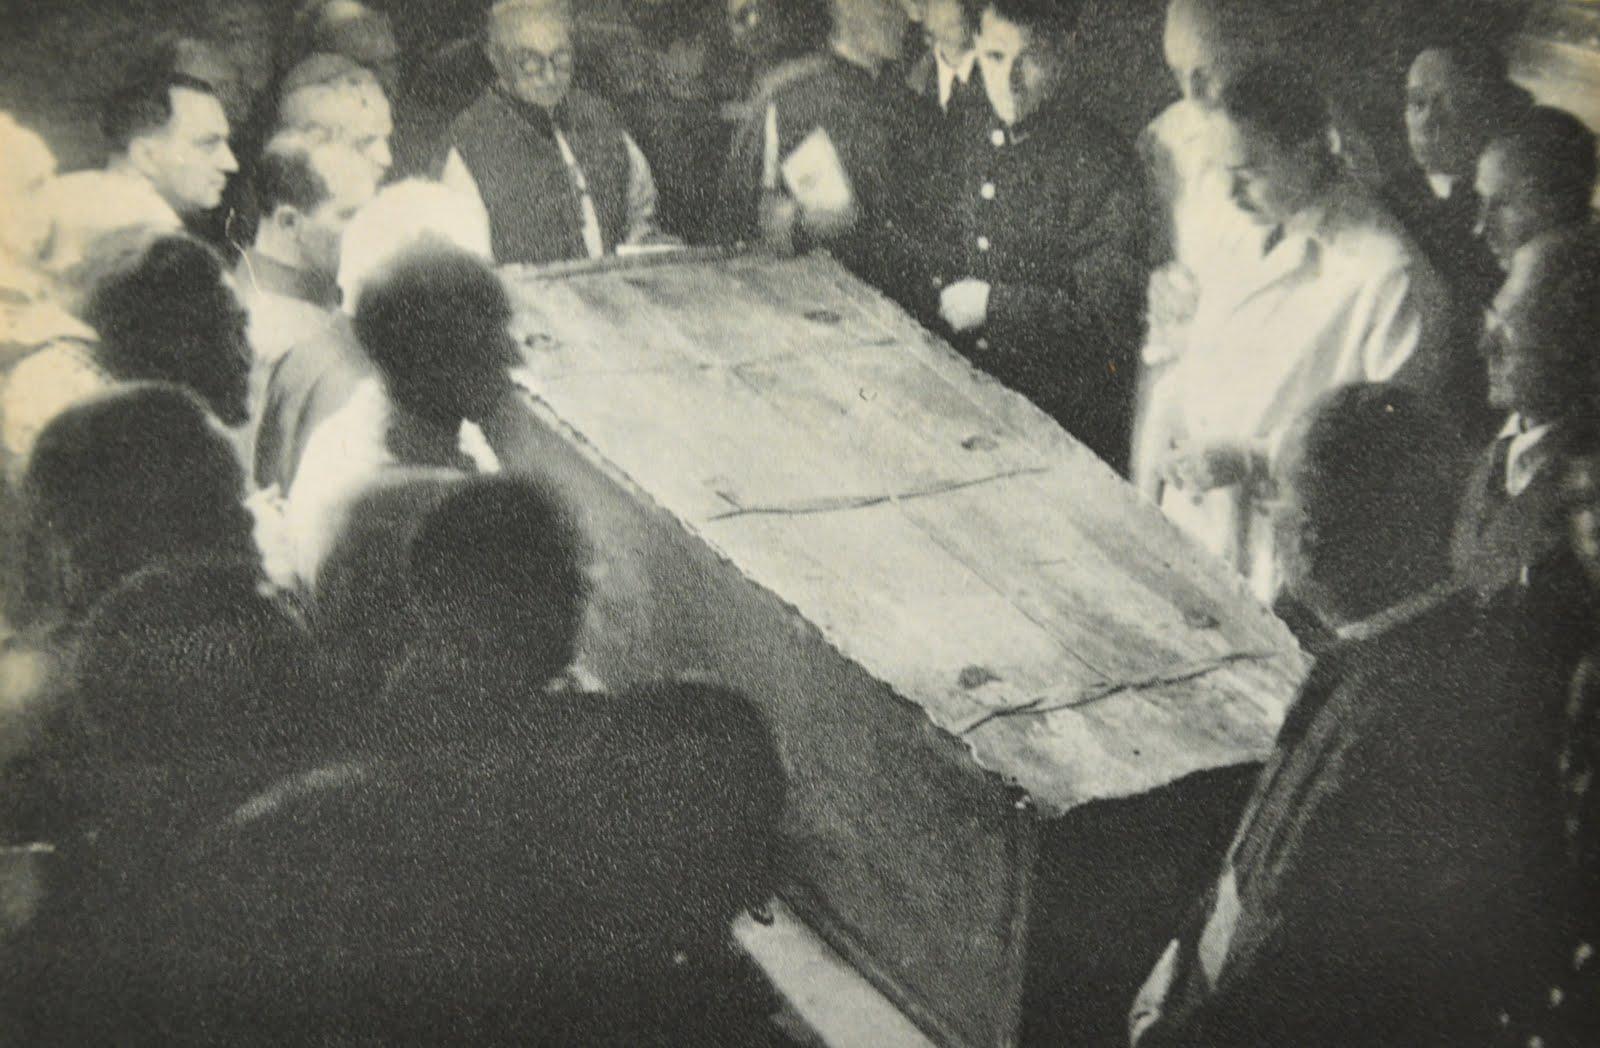 exhumation Pictures, Images & Photos | Photobucket